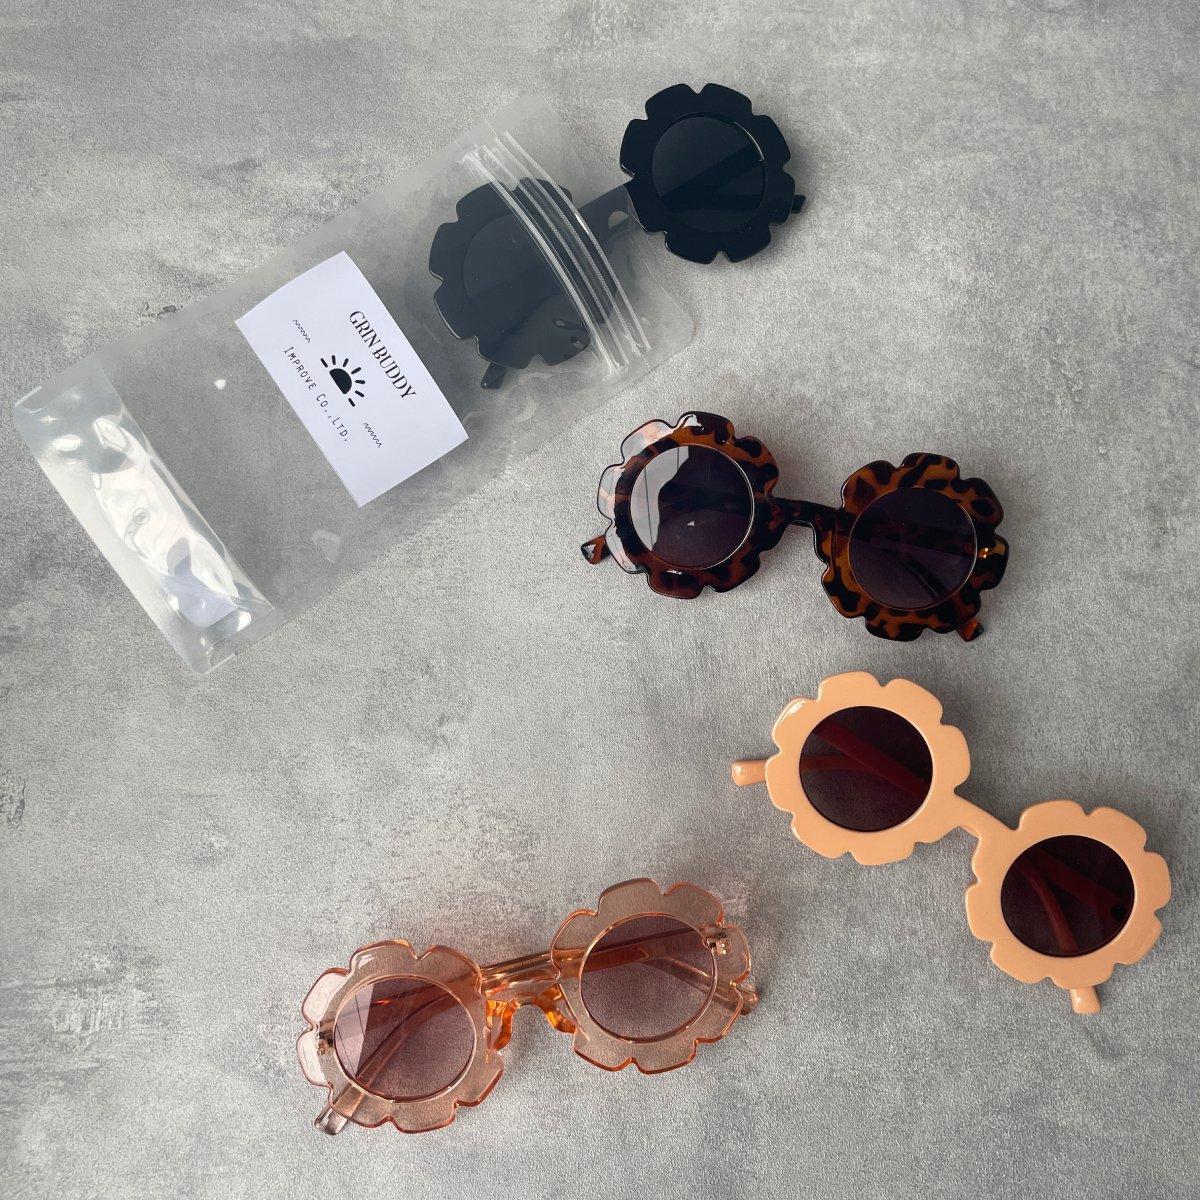 【KIDS】Kids Flower Sunglasses 詳細画像6